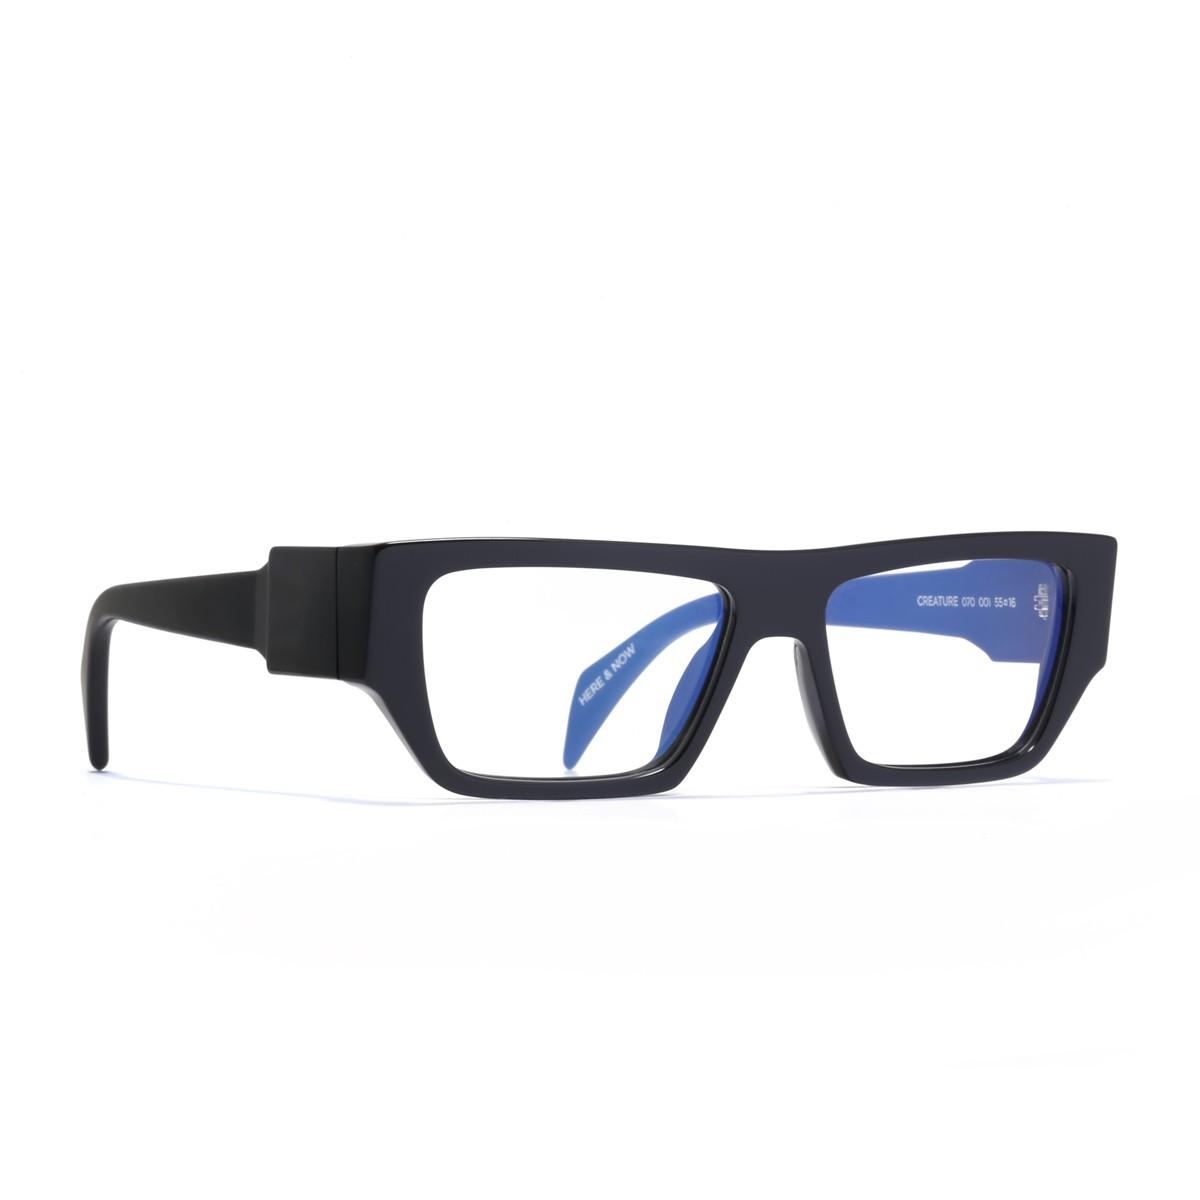 Siens Eye code 070 | Occhiali da vista Unisex